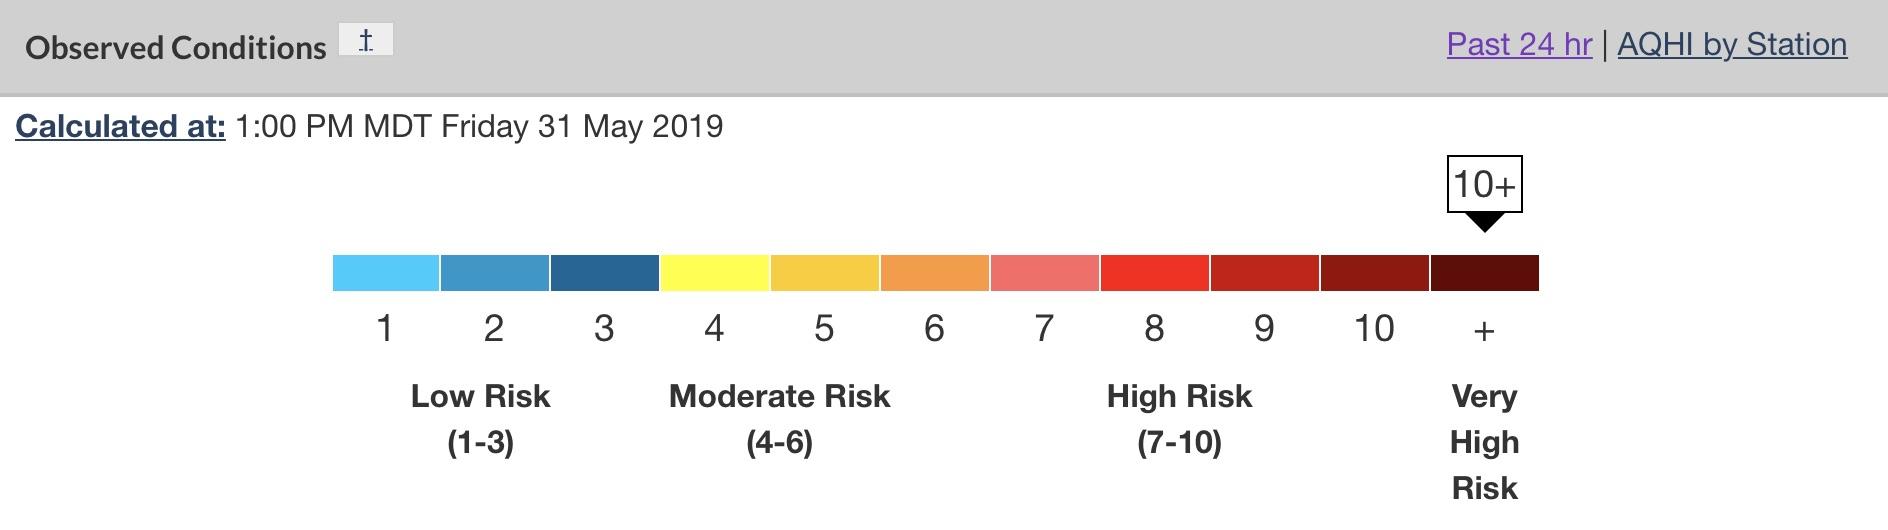 Calgary Alberta - Air Quality Health Index AQHI - Environment Canada